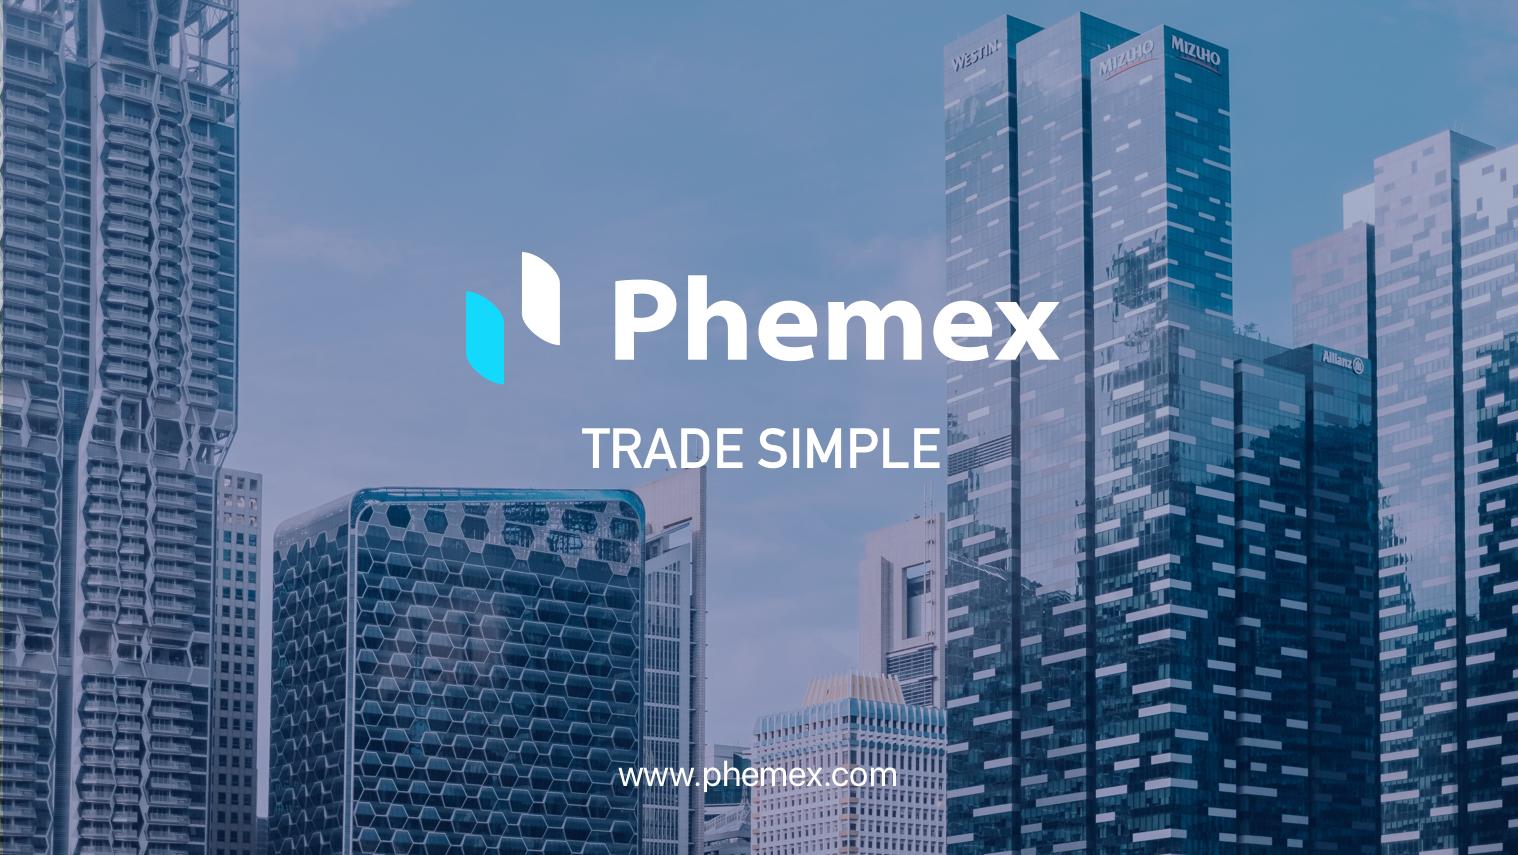 phemex crypto trading